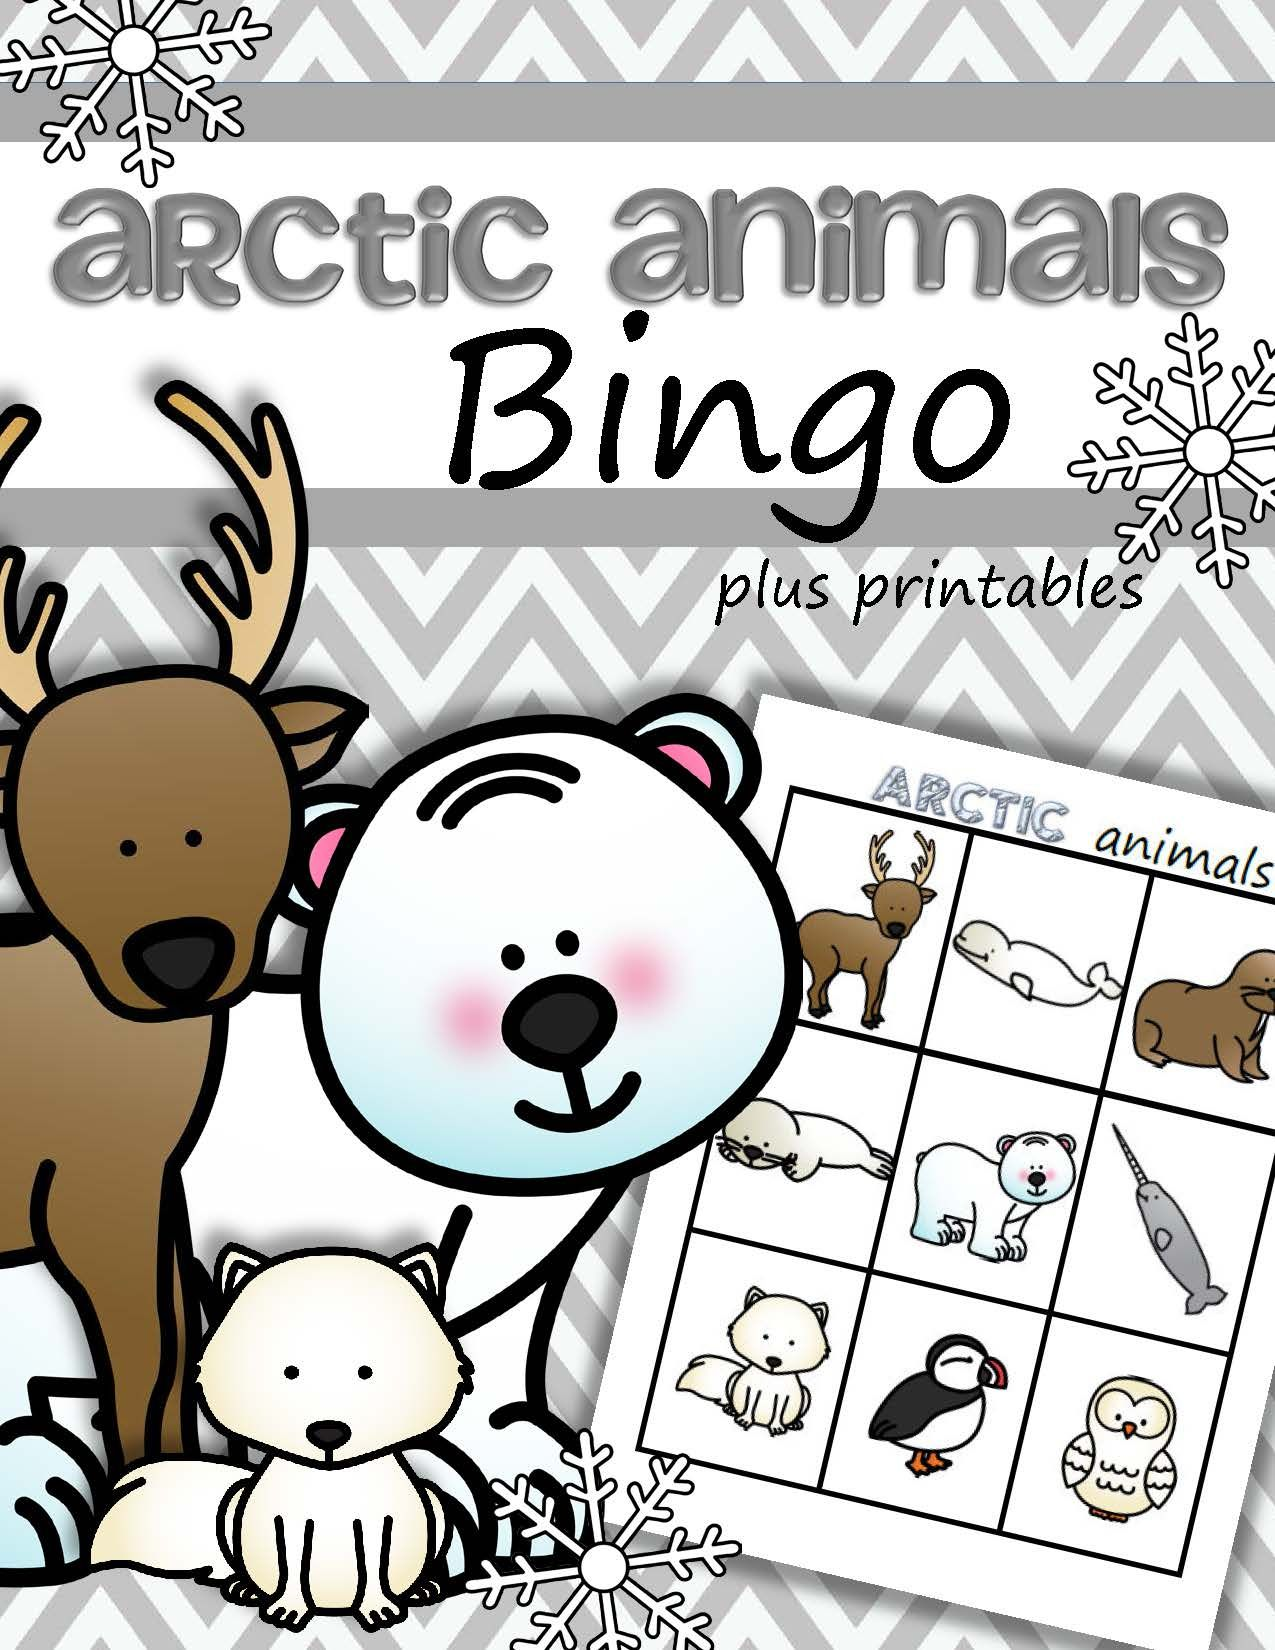 Arctic Animals Bingo Game Arctic Animals Preschool Arctic Animals Preschool Activities Arctic Animals [ 1650 x 1275 Pixel ]